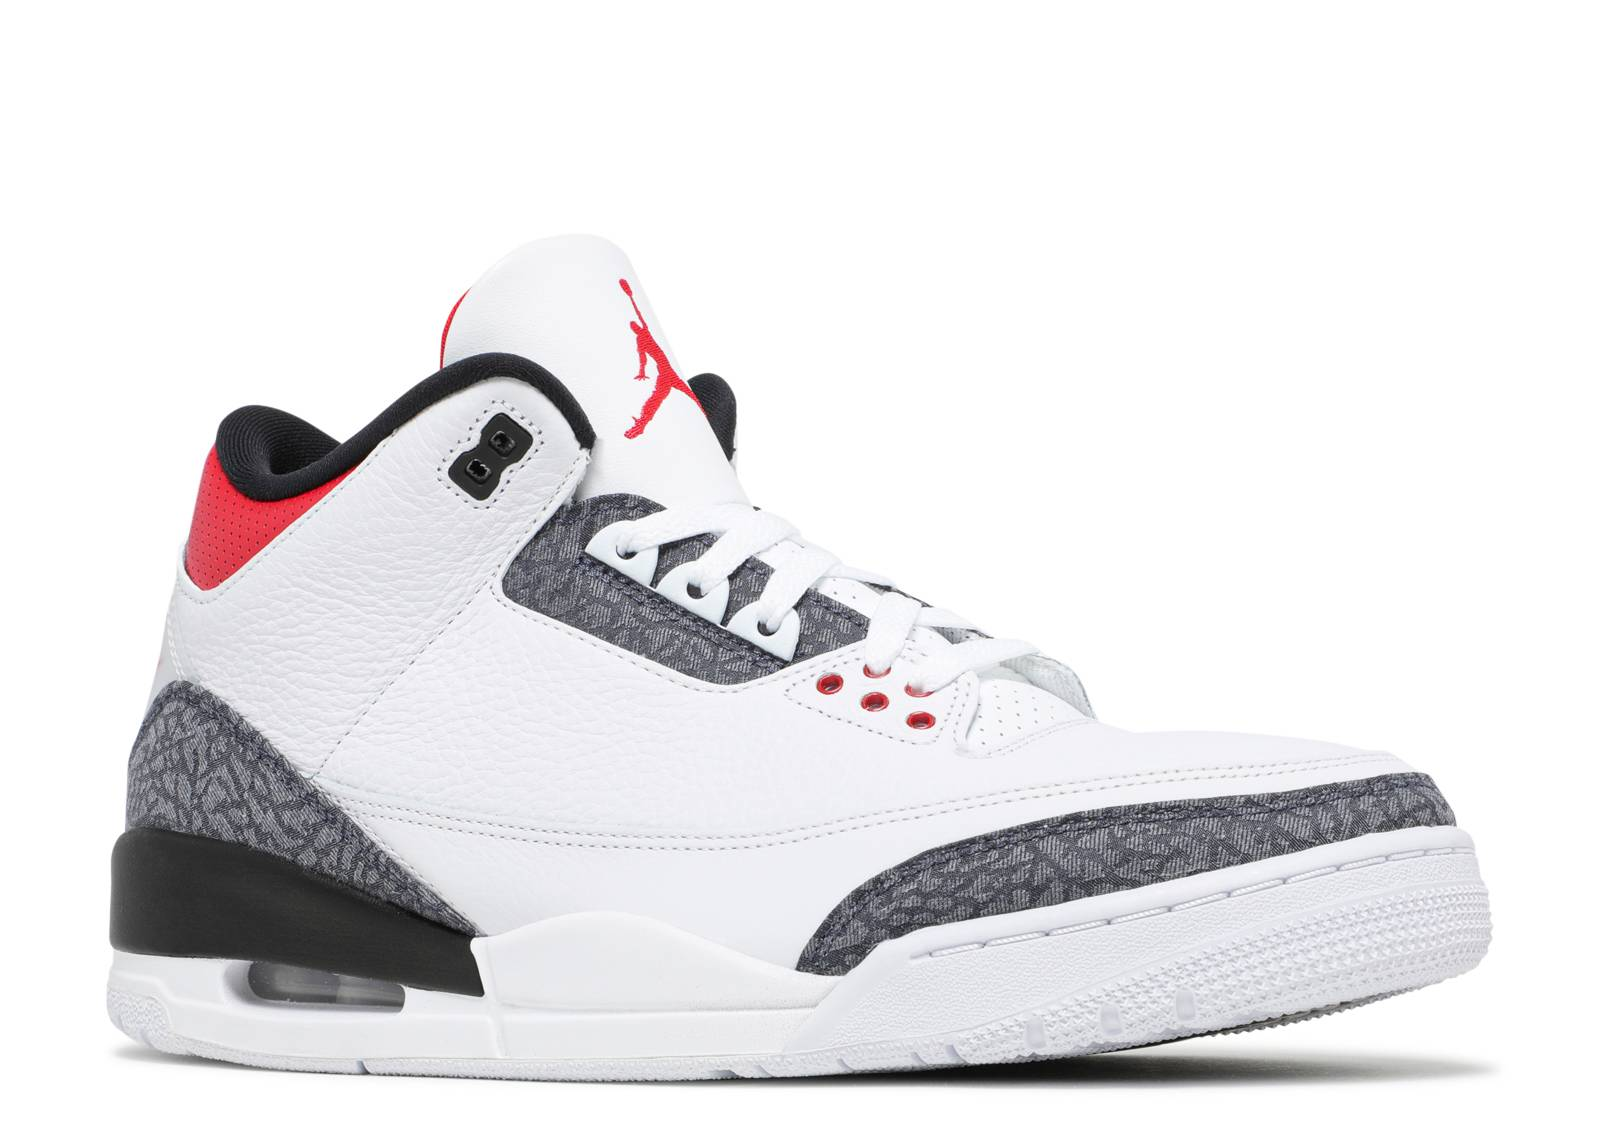 Air Jordan 3 Retro Denim SE 'Fire Red'